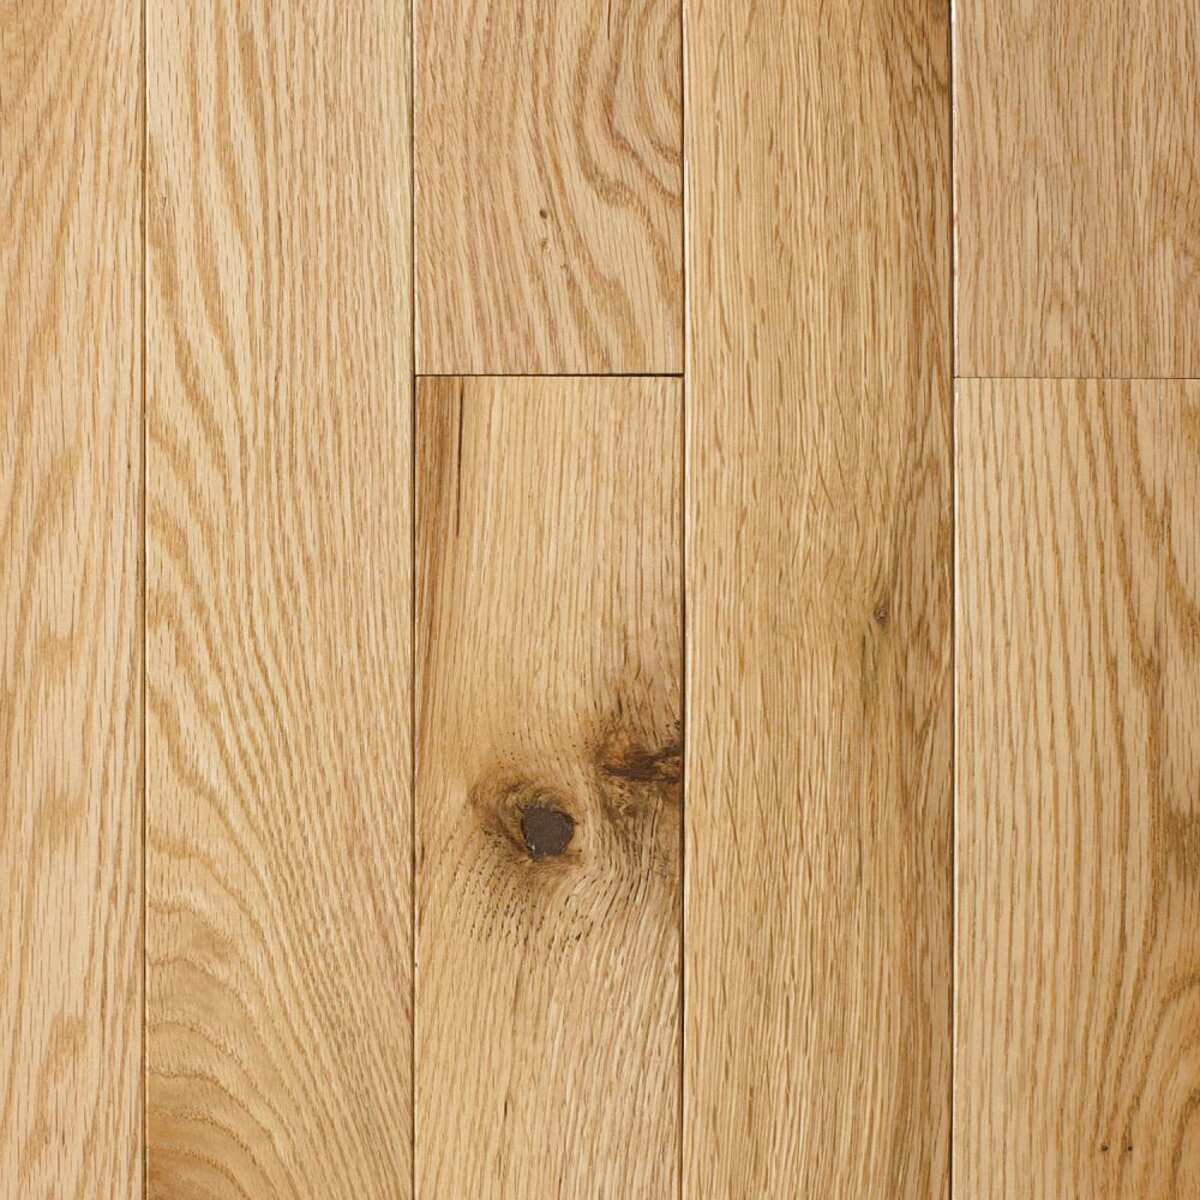 oak flooring for sale